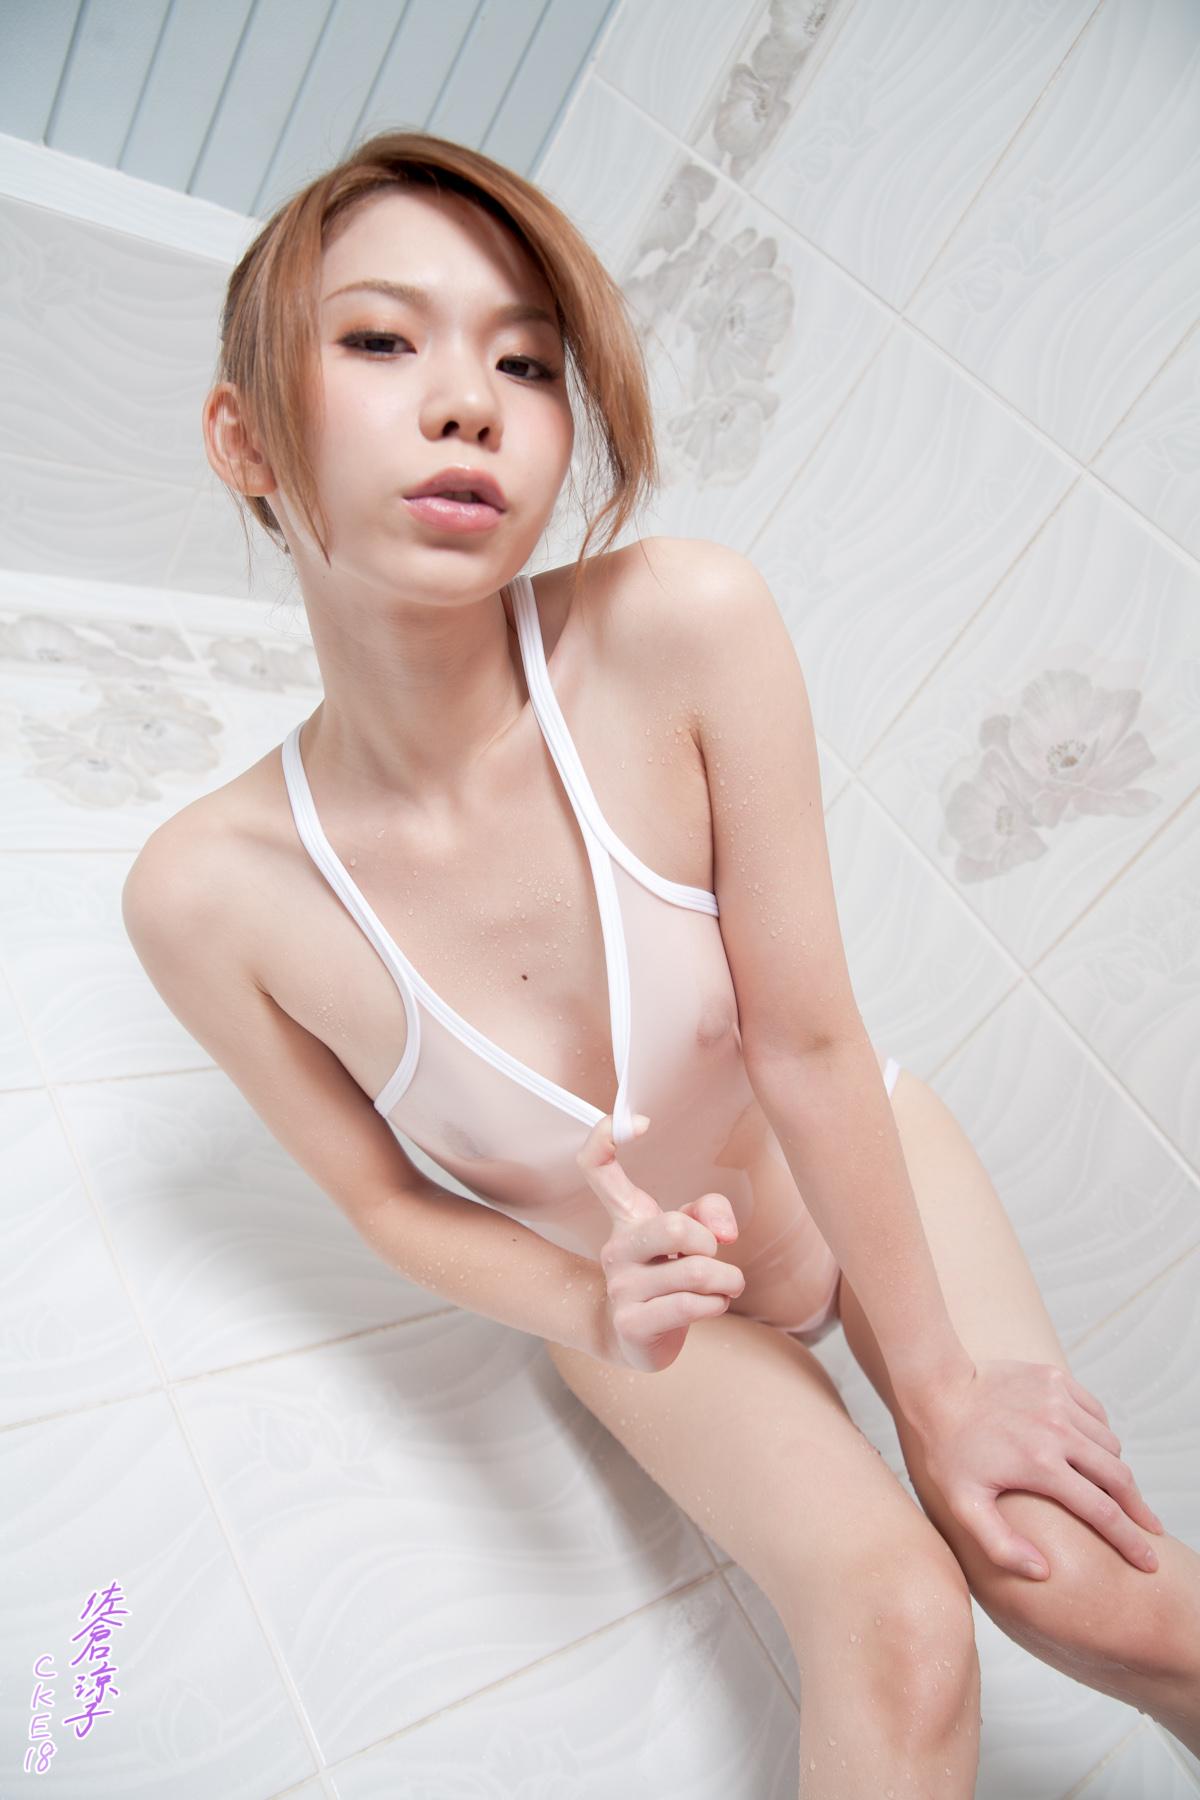 Delphine dijon nude